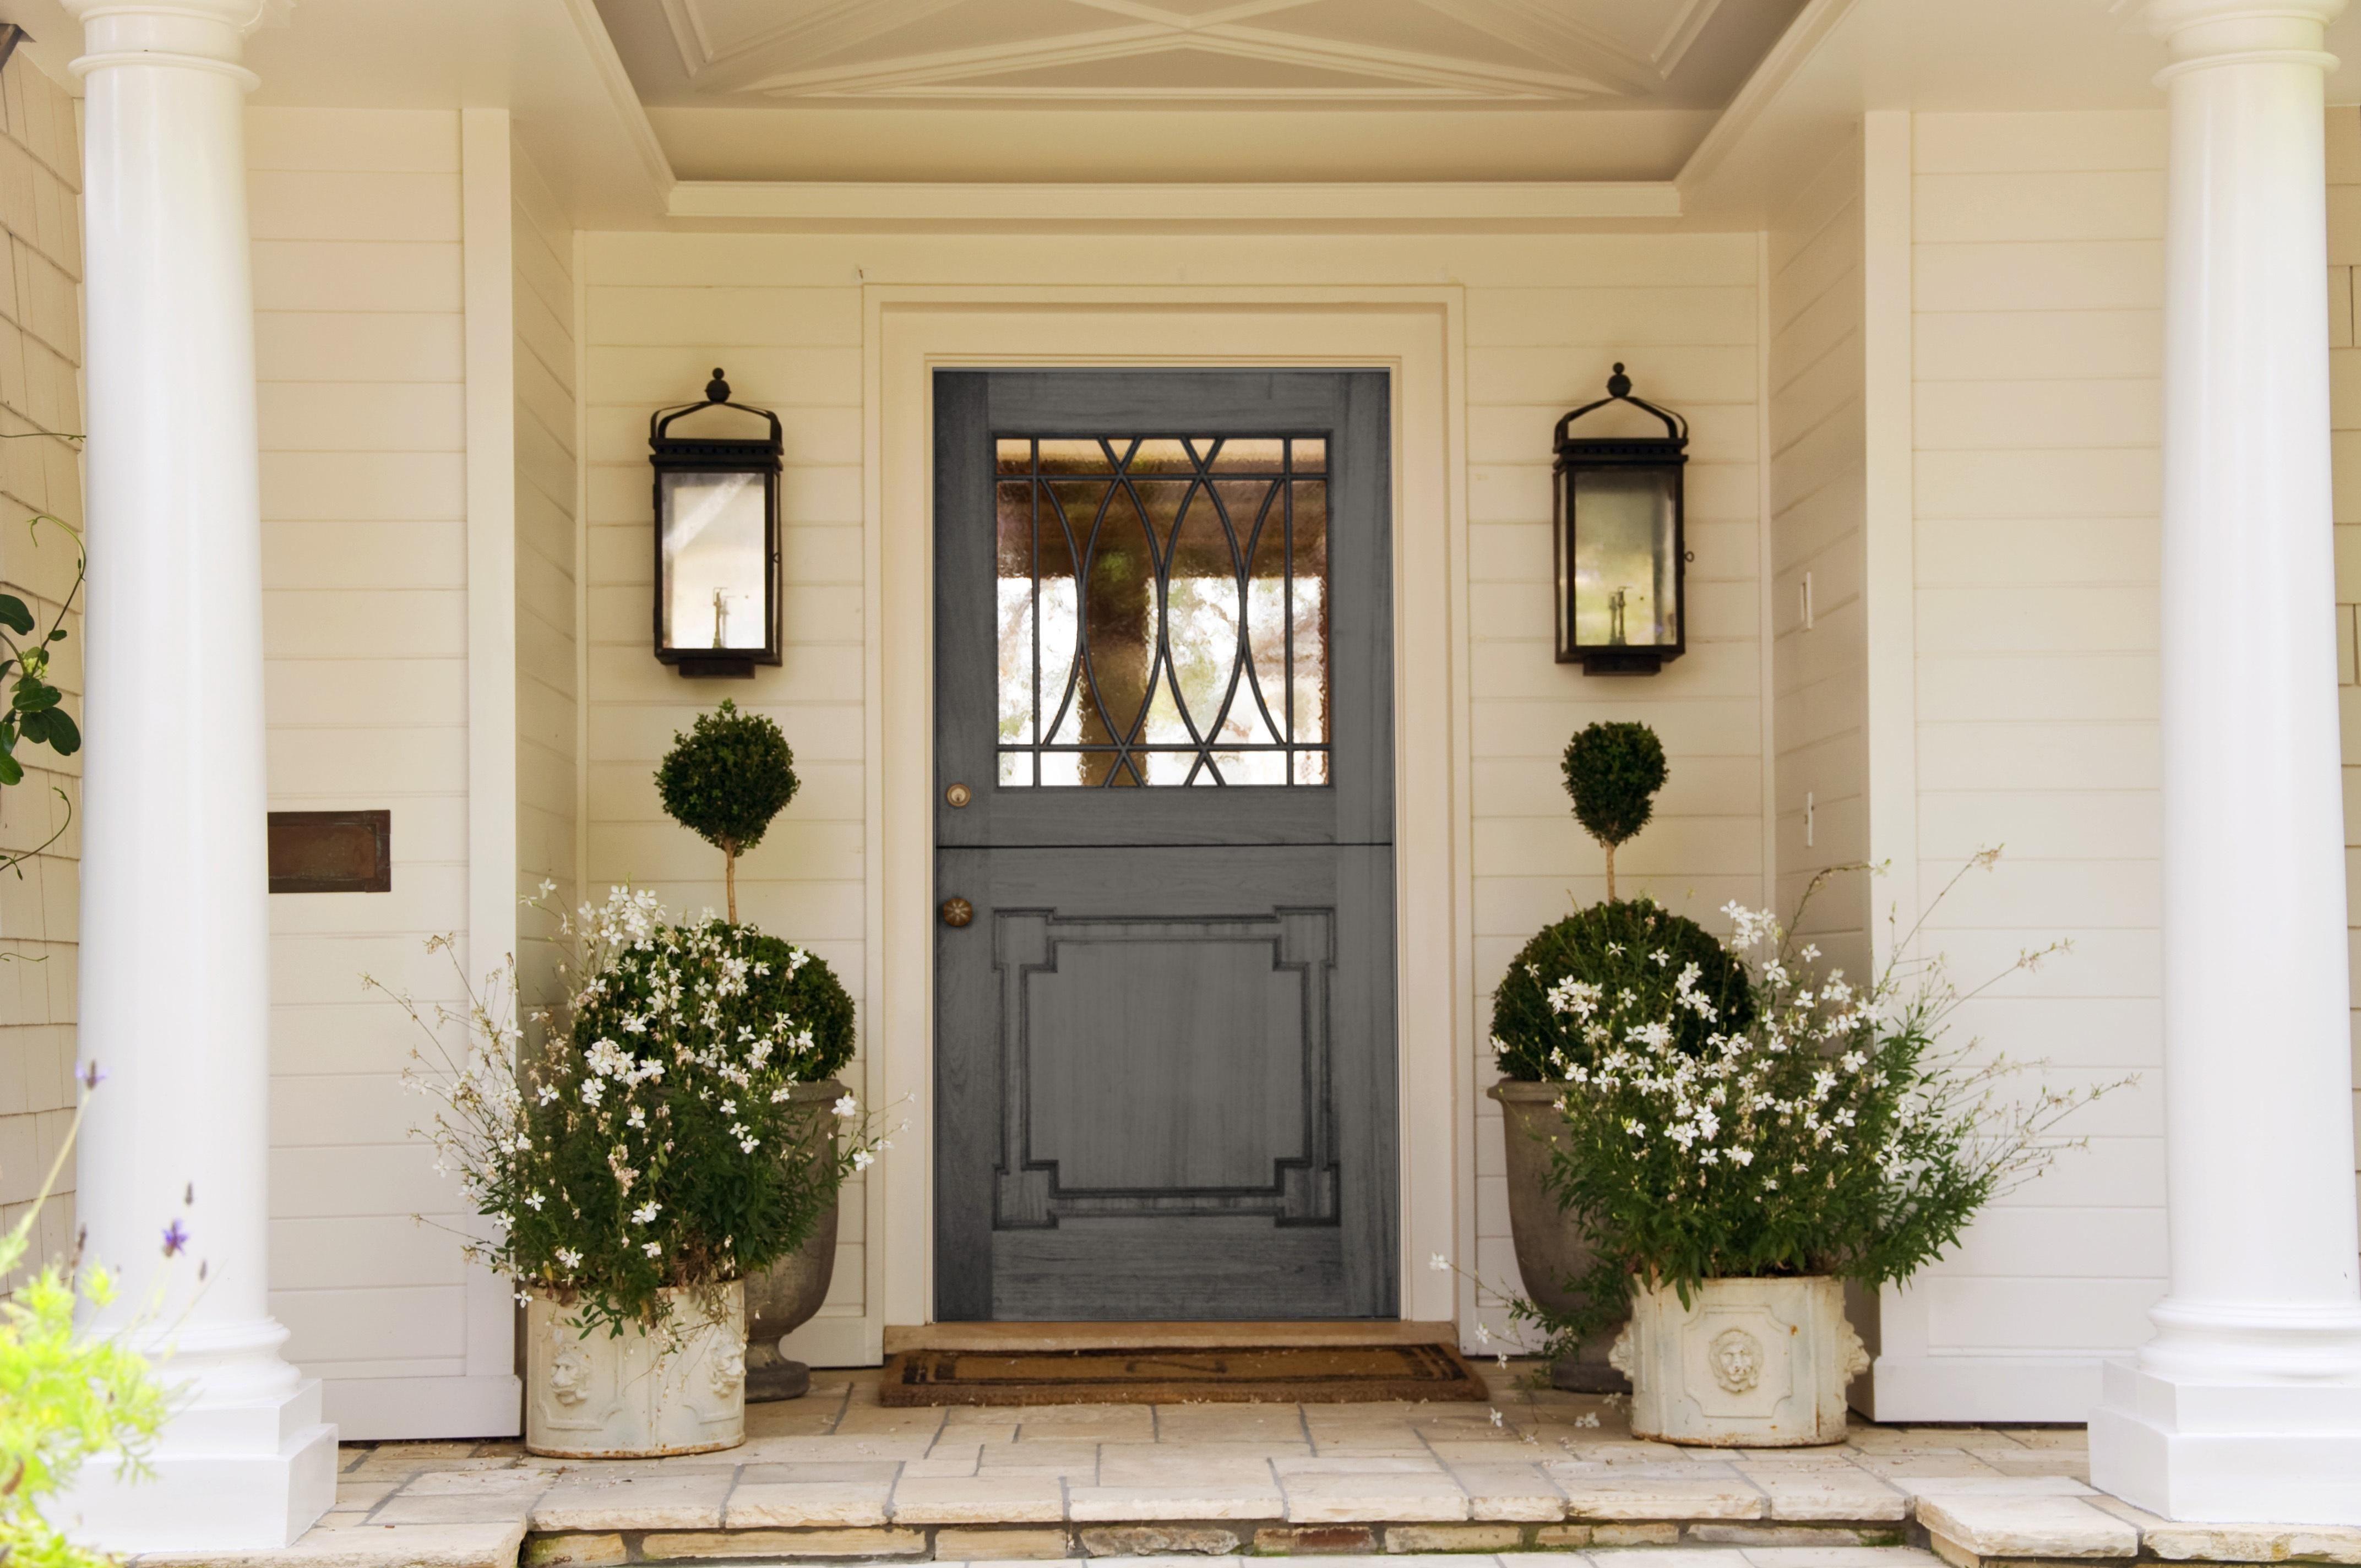 Diy Exterior Dutch Door Refinishing Fiberglass Exterior Doors A Properly Refinished